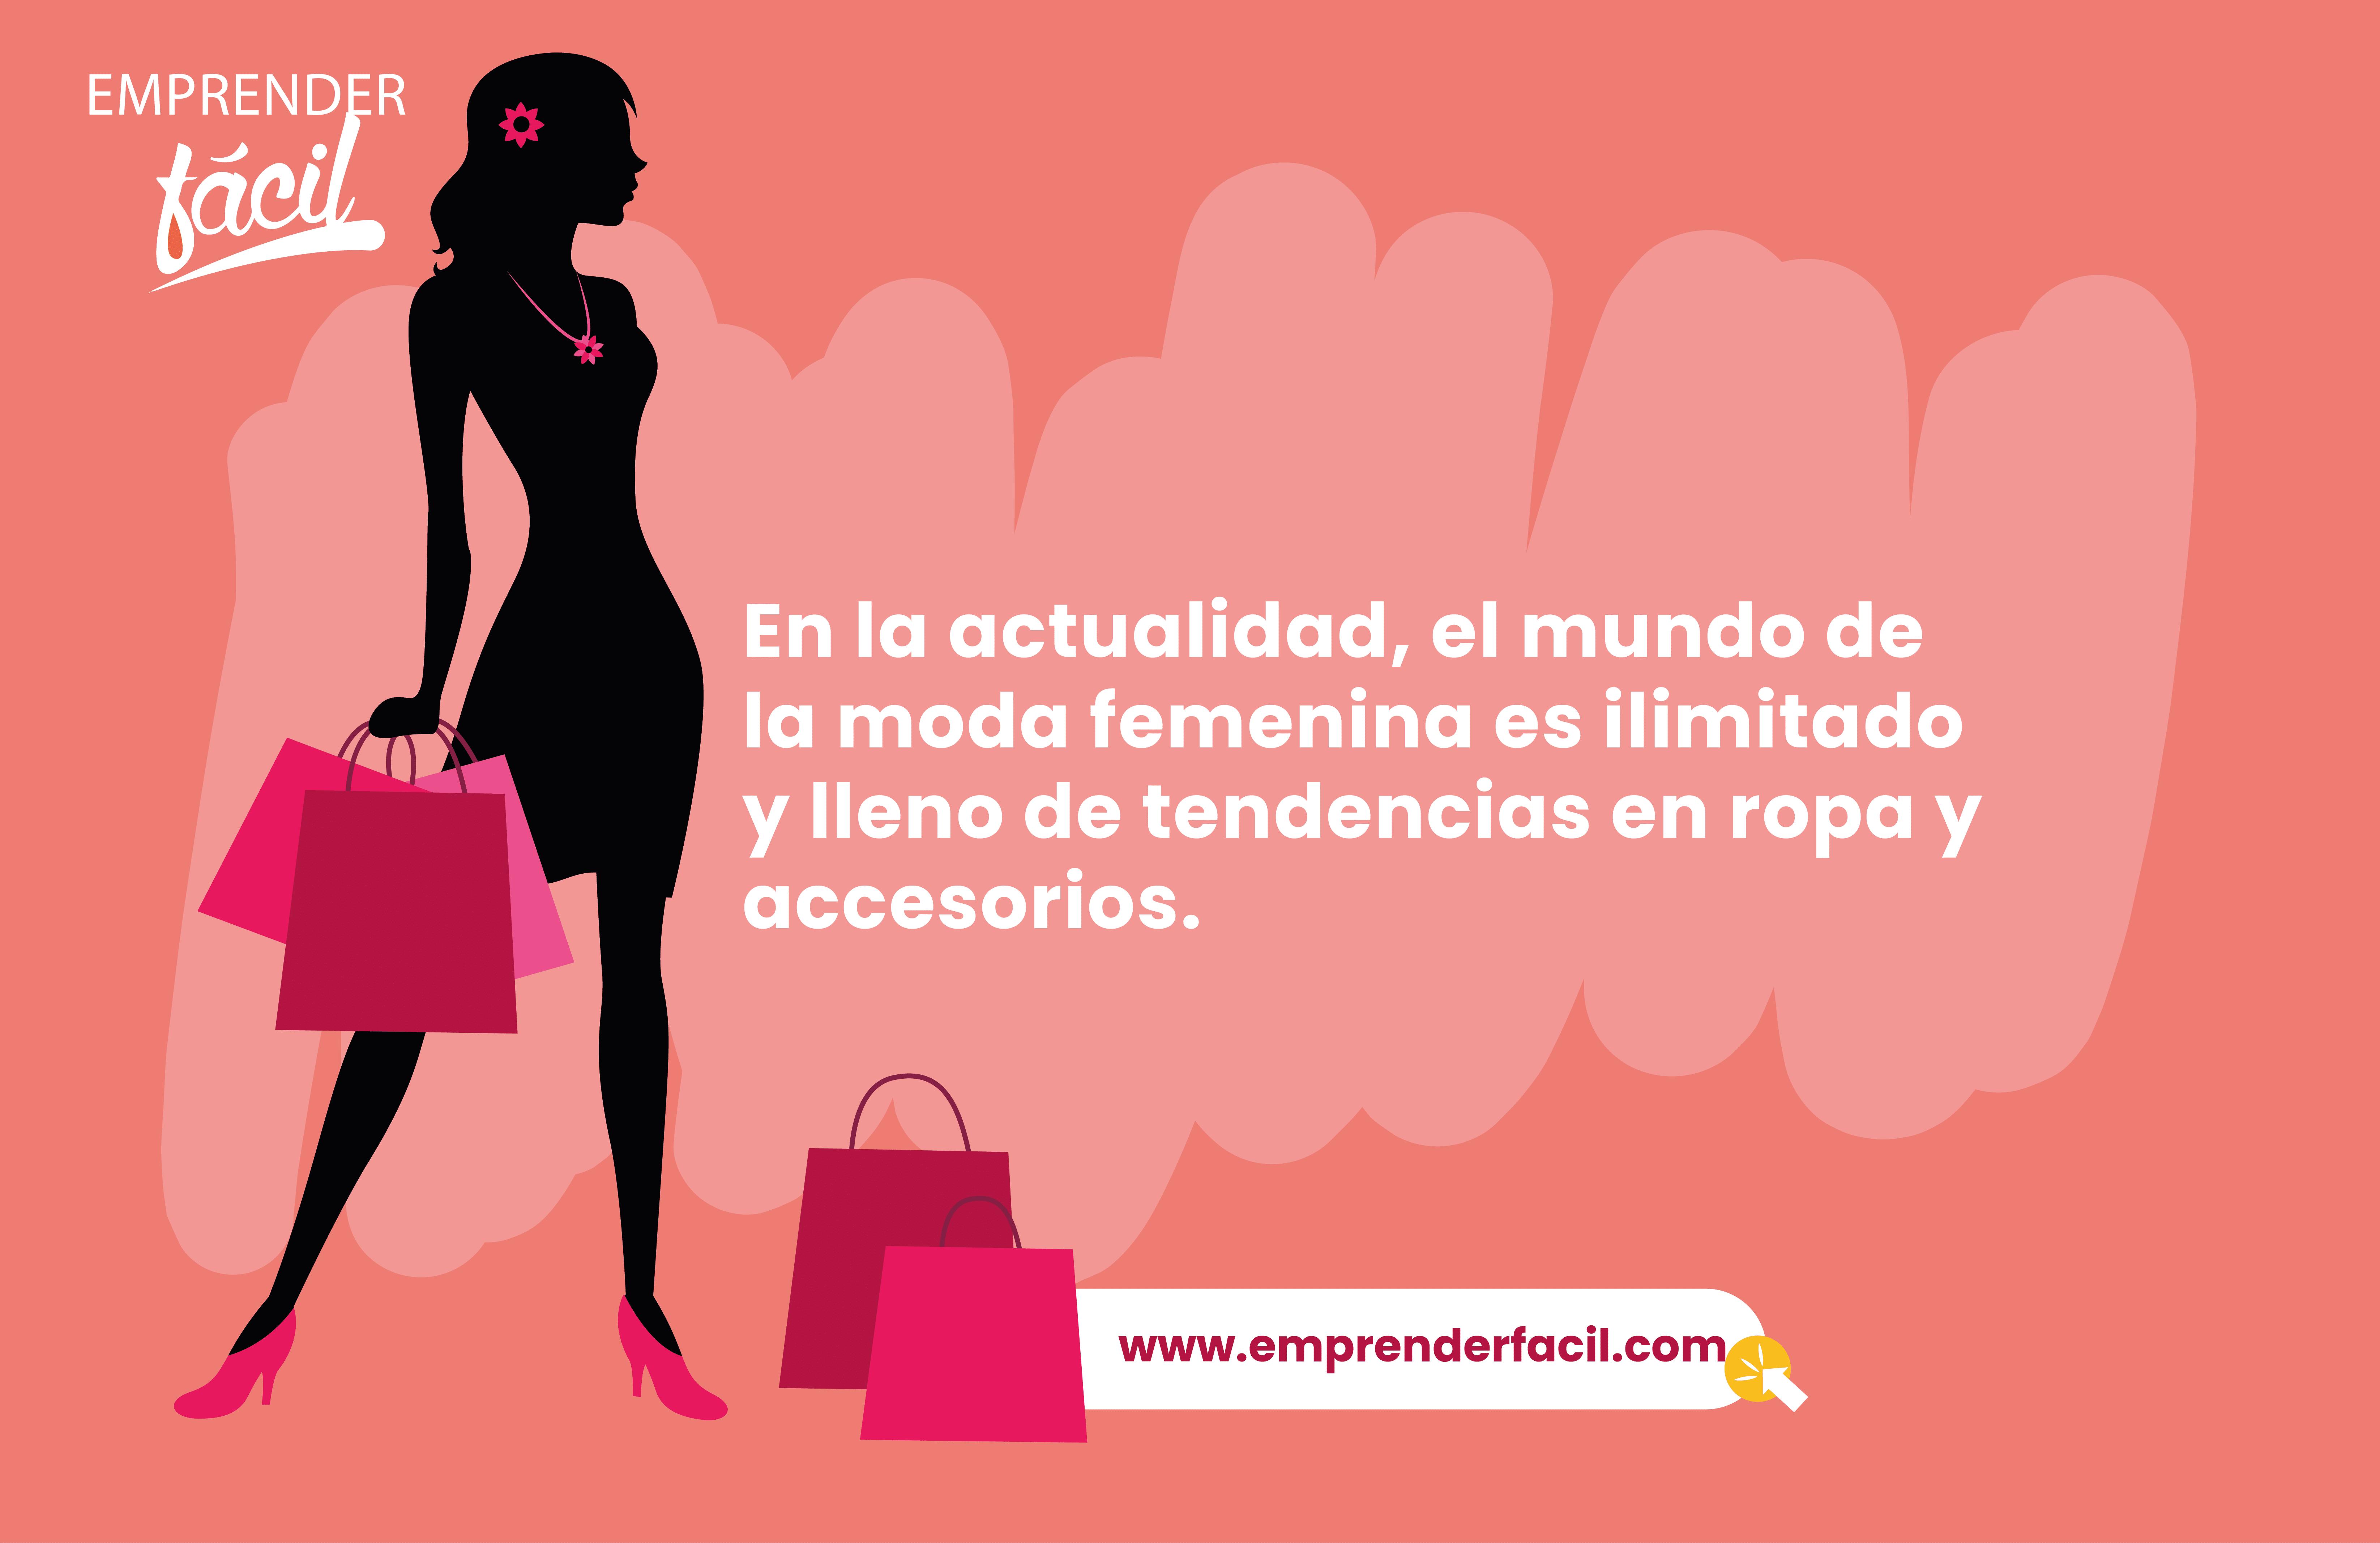 La moda femenina es ilimitada.